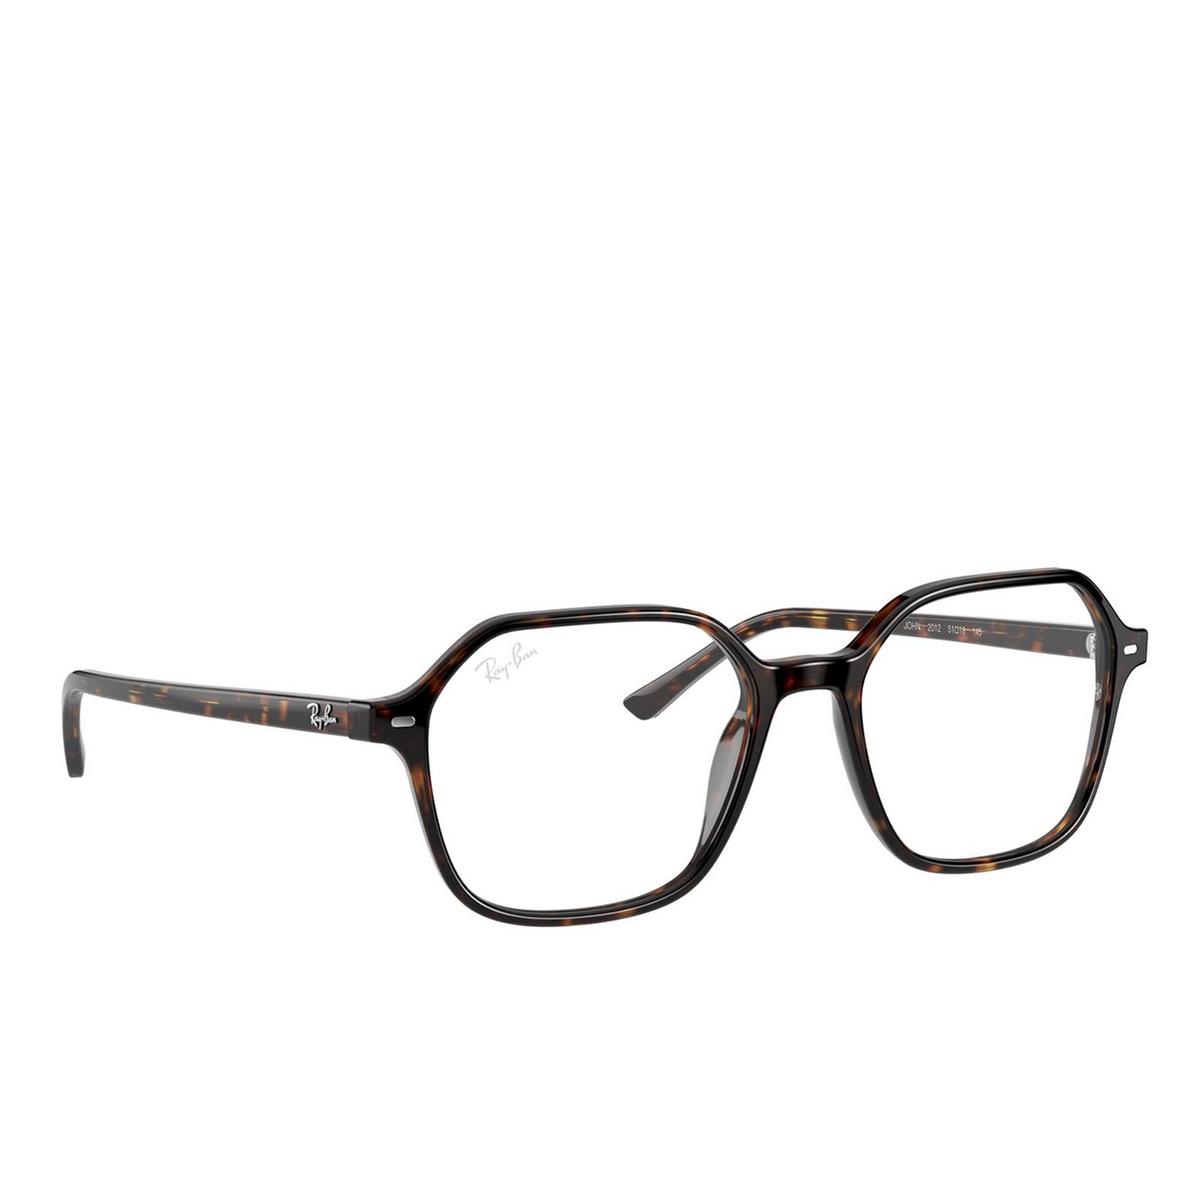 Ray-Ban® Square Eyeglasses: John RX5394 color Havana 2012.